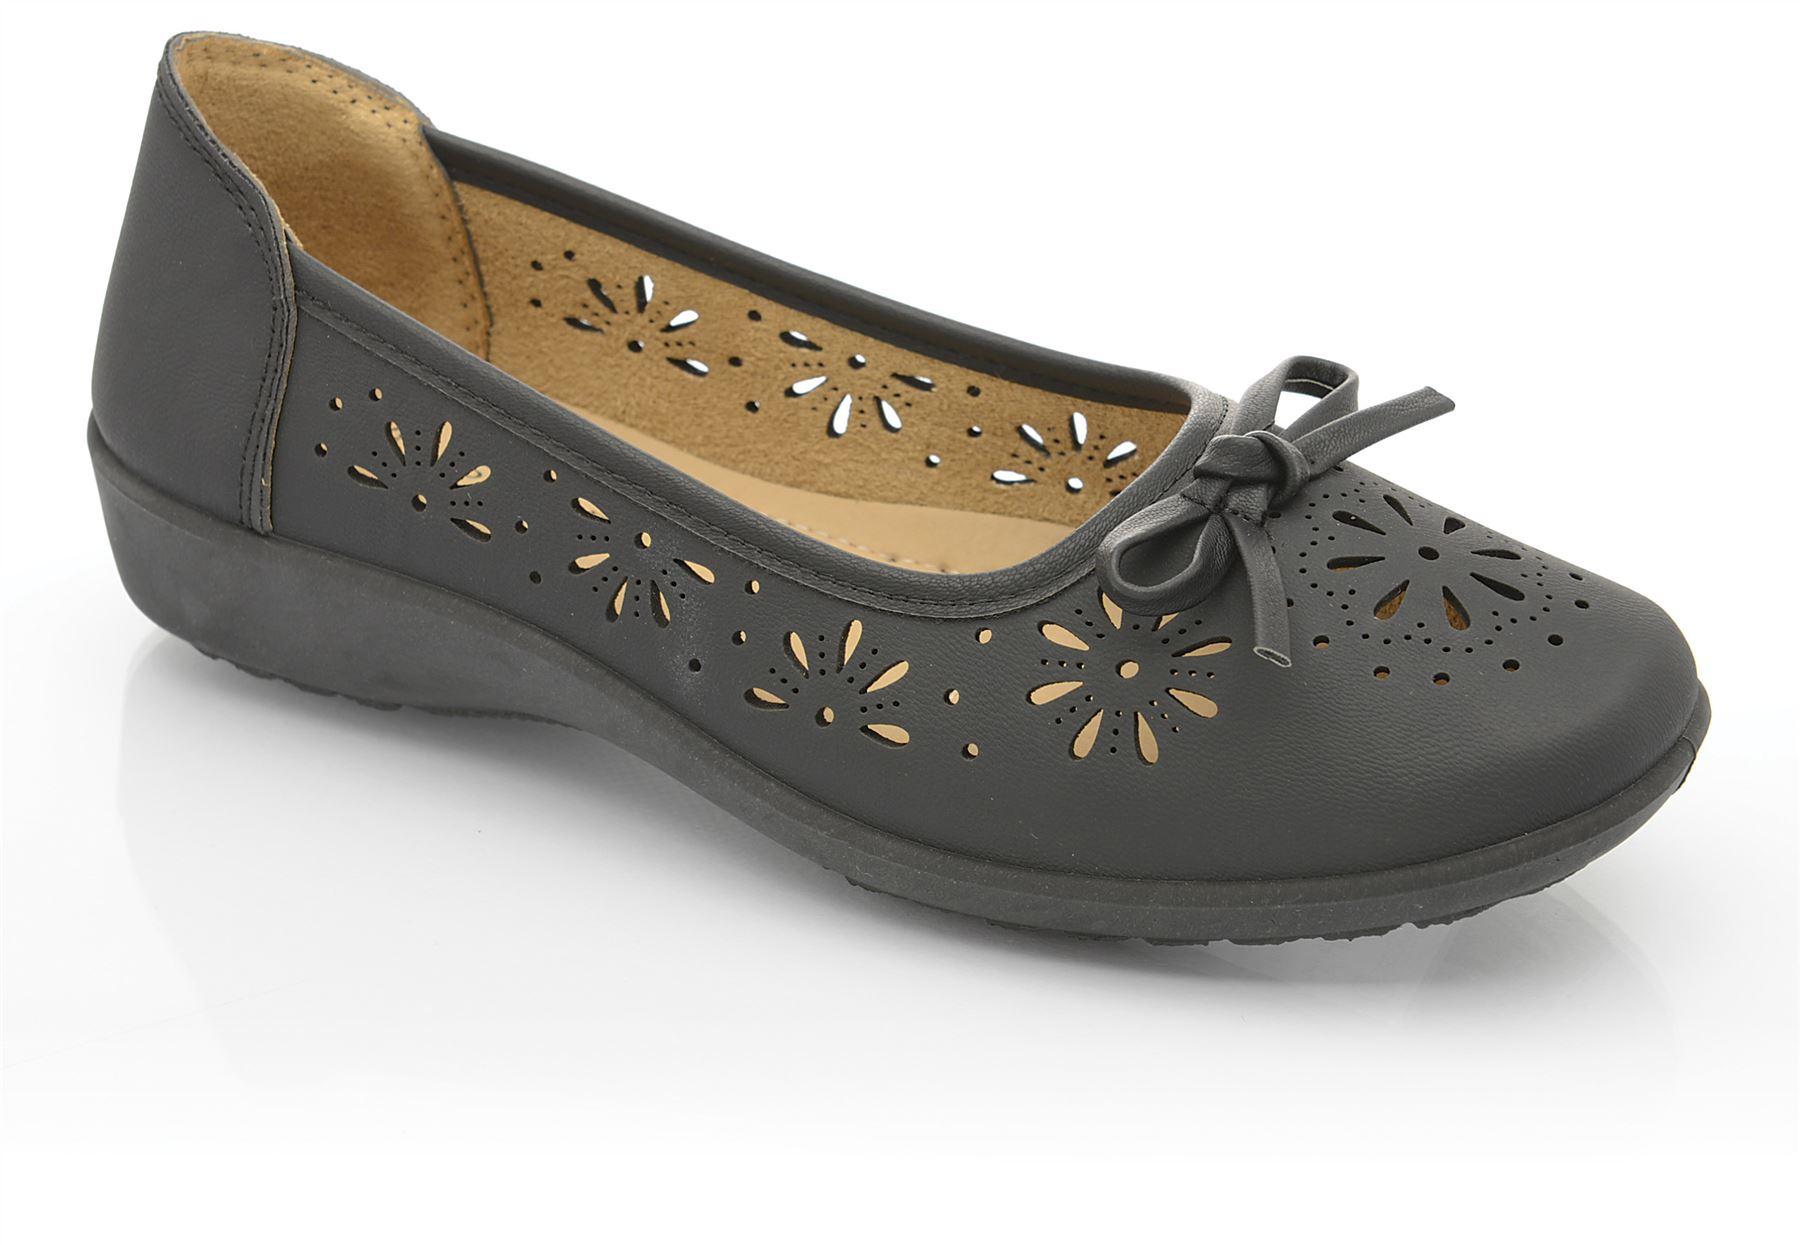 damen classique comfort pu ausgeschnittenes leder slipper. Black Bedroom Furniture Sets. Home Design Ideas